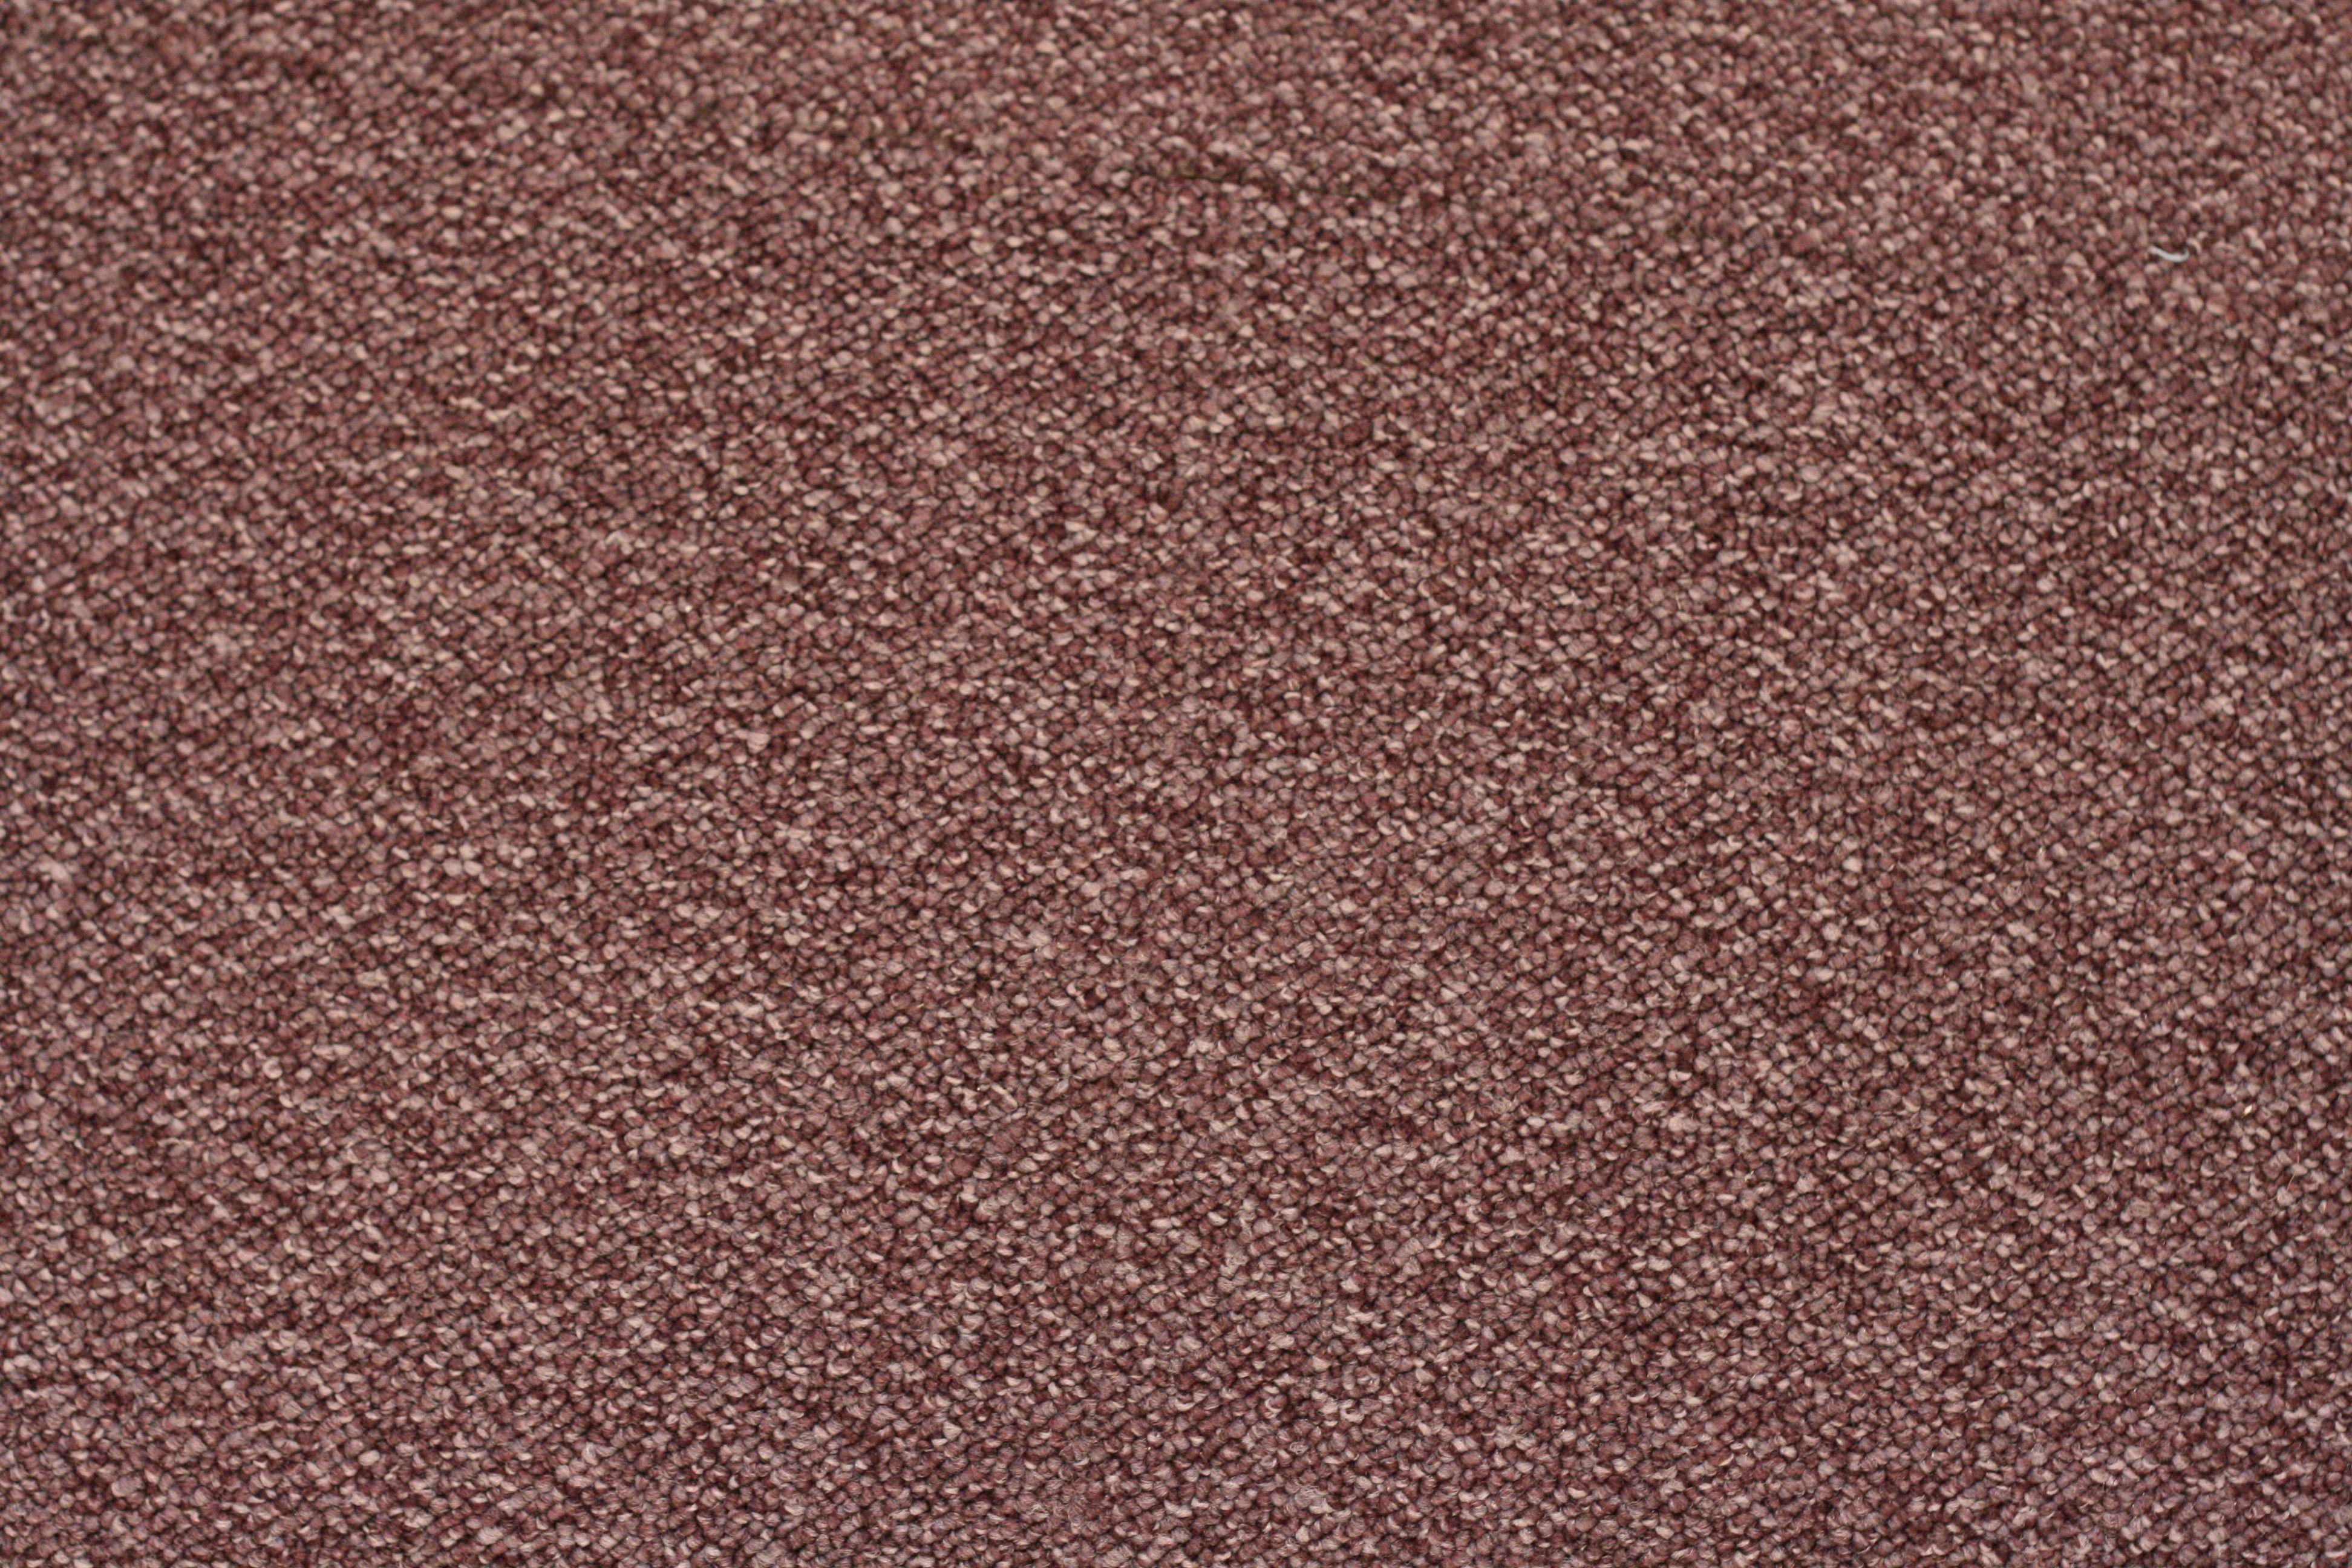 Carpet  Google Search  Carpet  Textured carpet Office